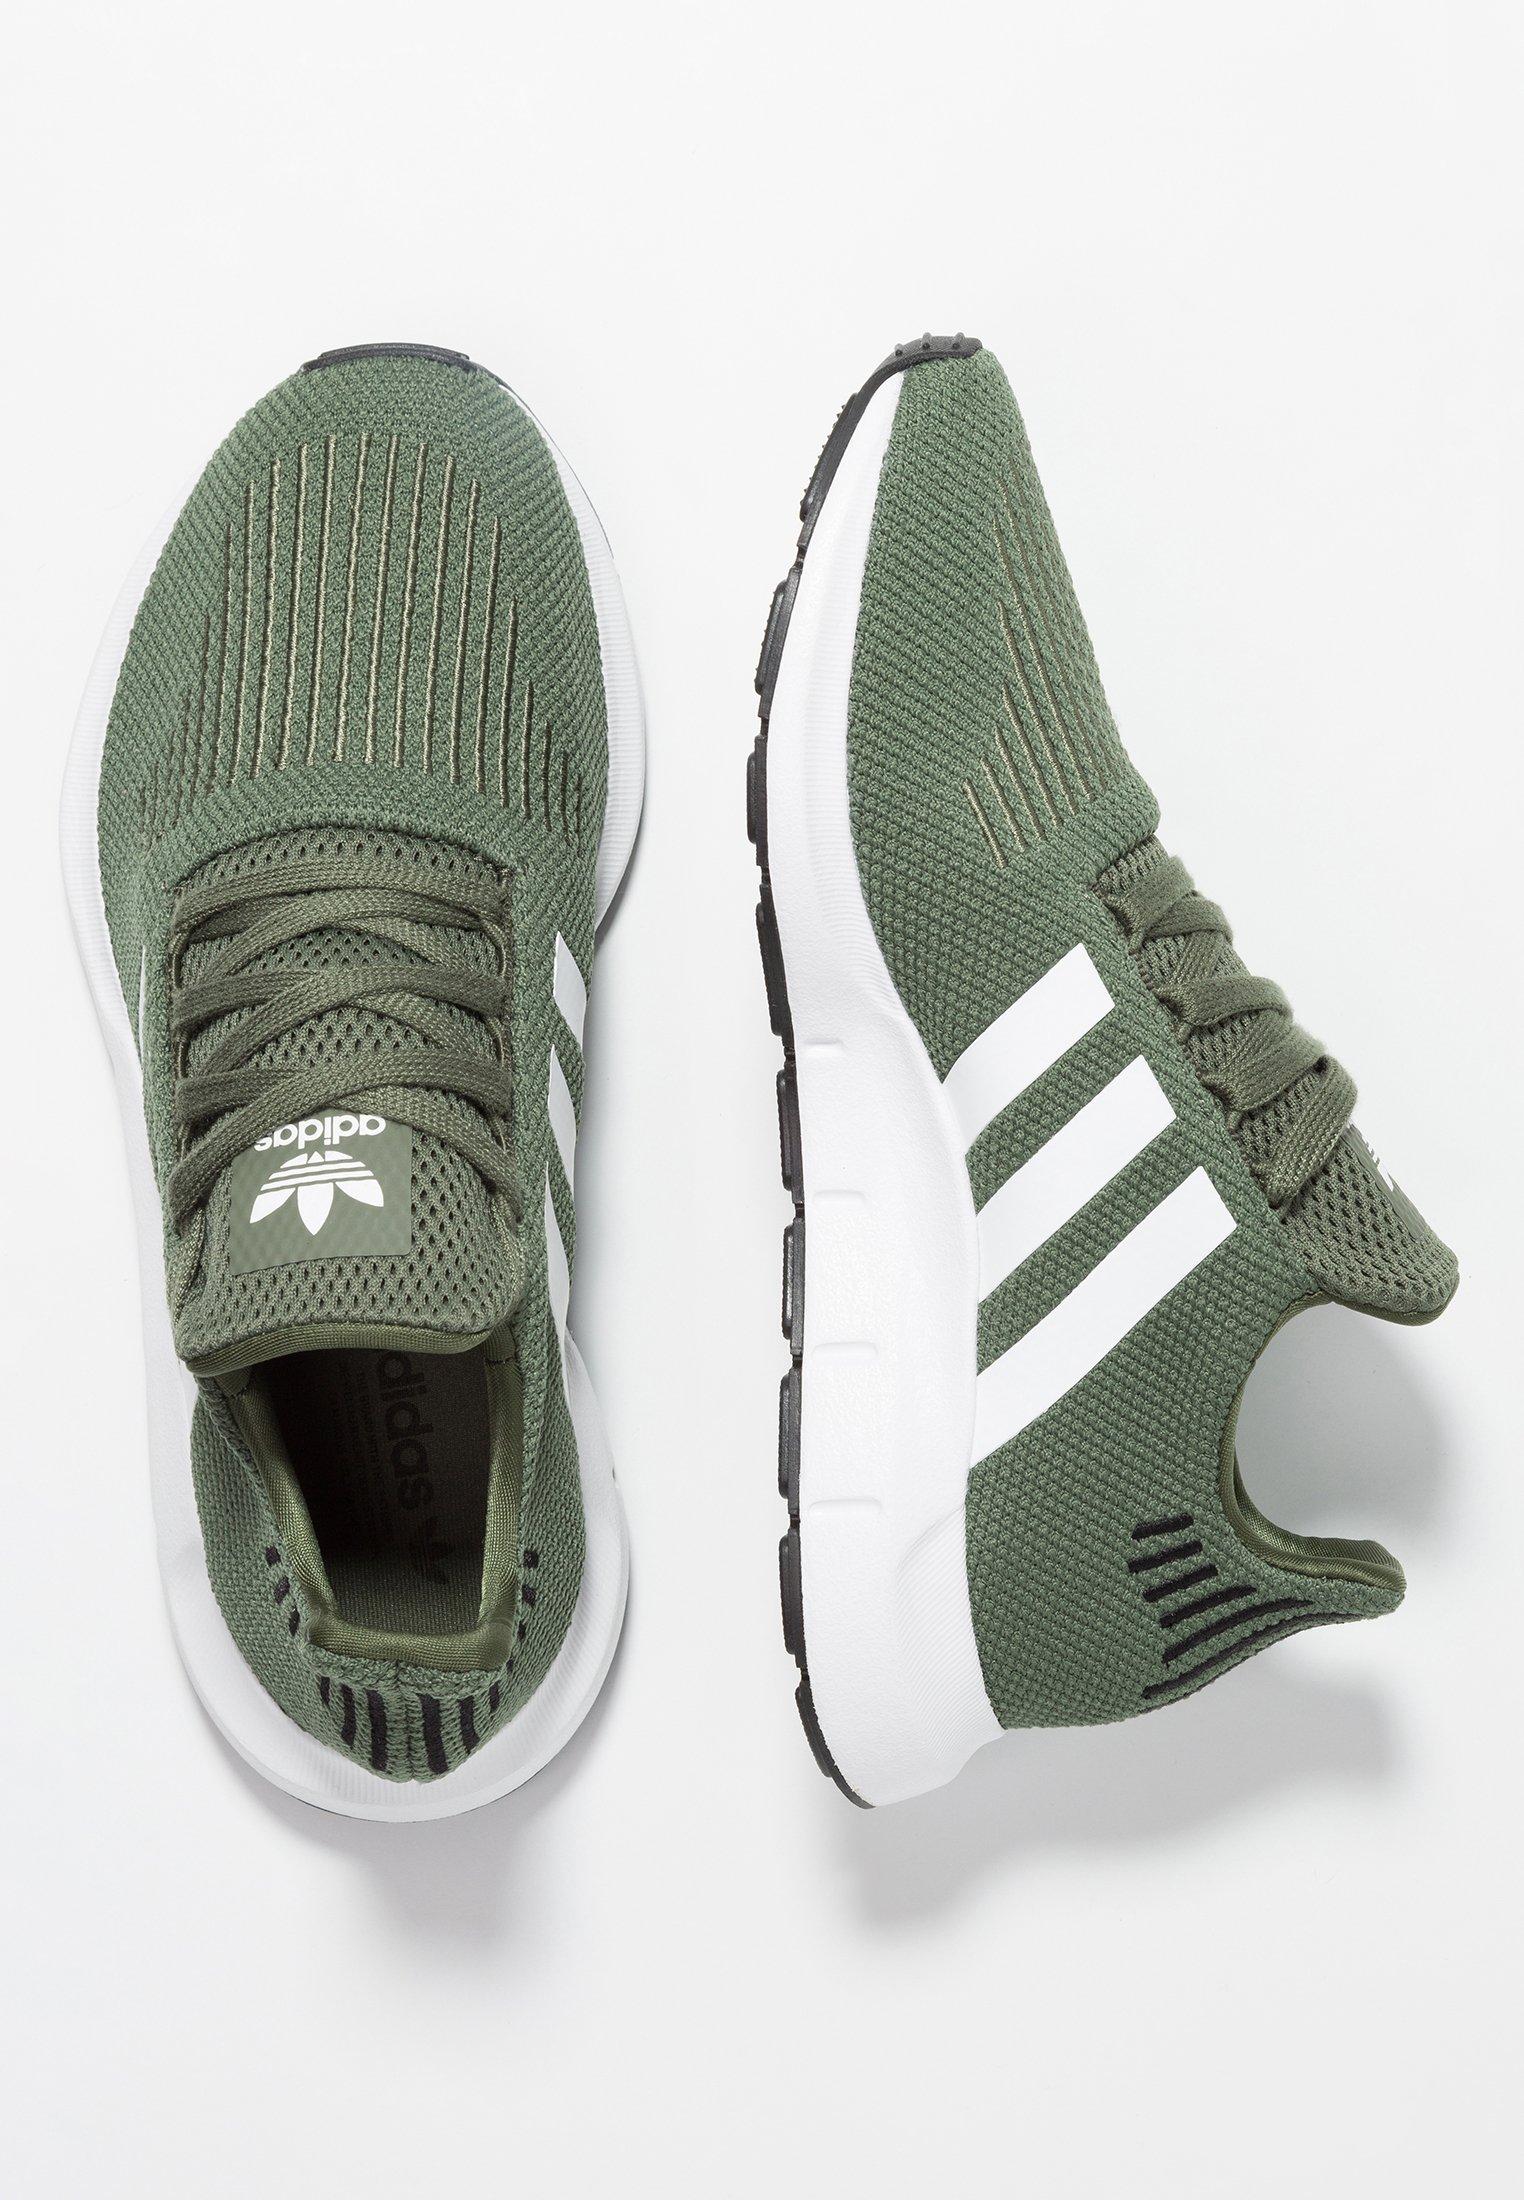 Kjøp adidas Originals Swift Run W Basgrnftwwhtcblack sko